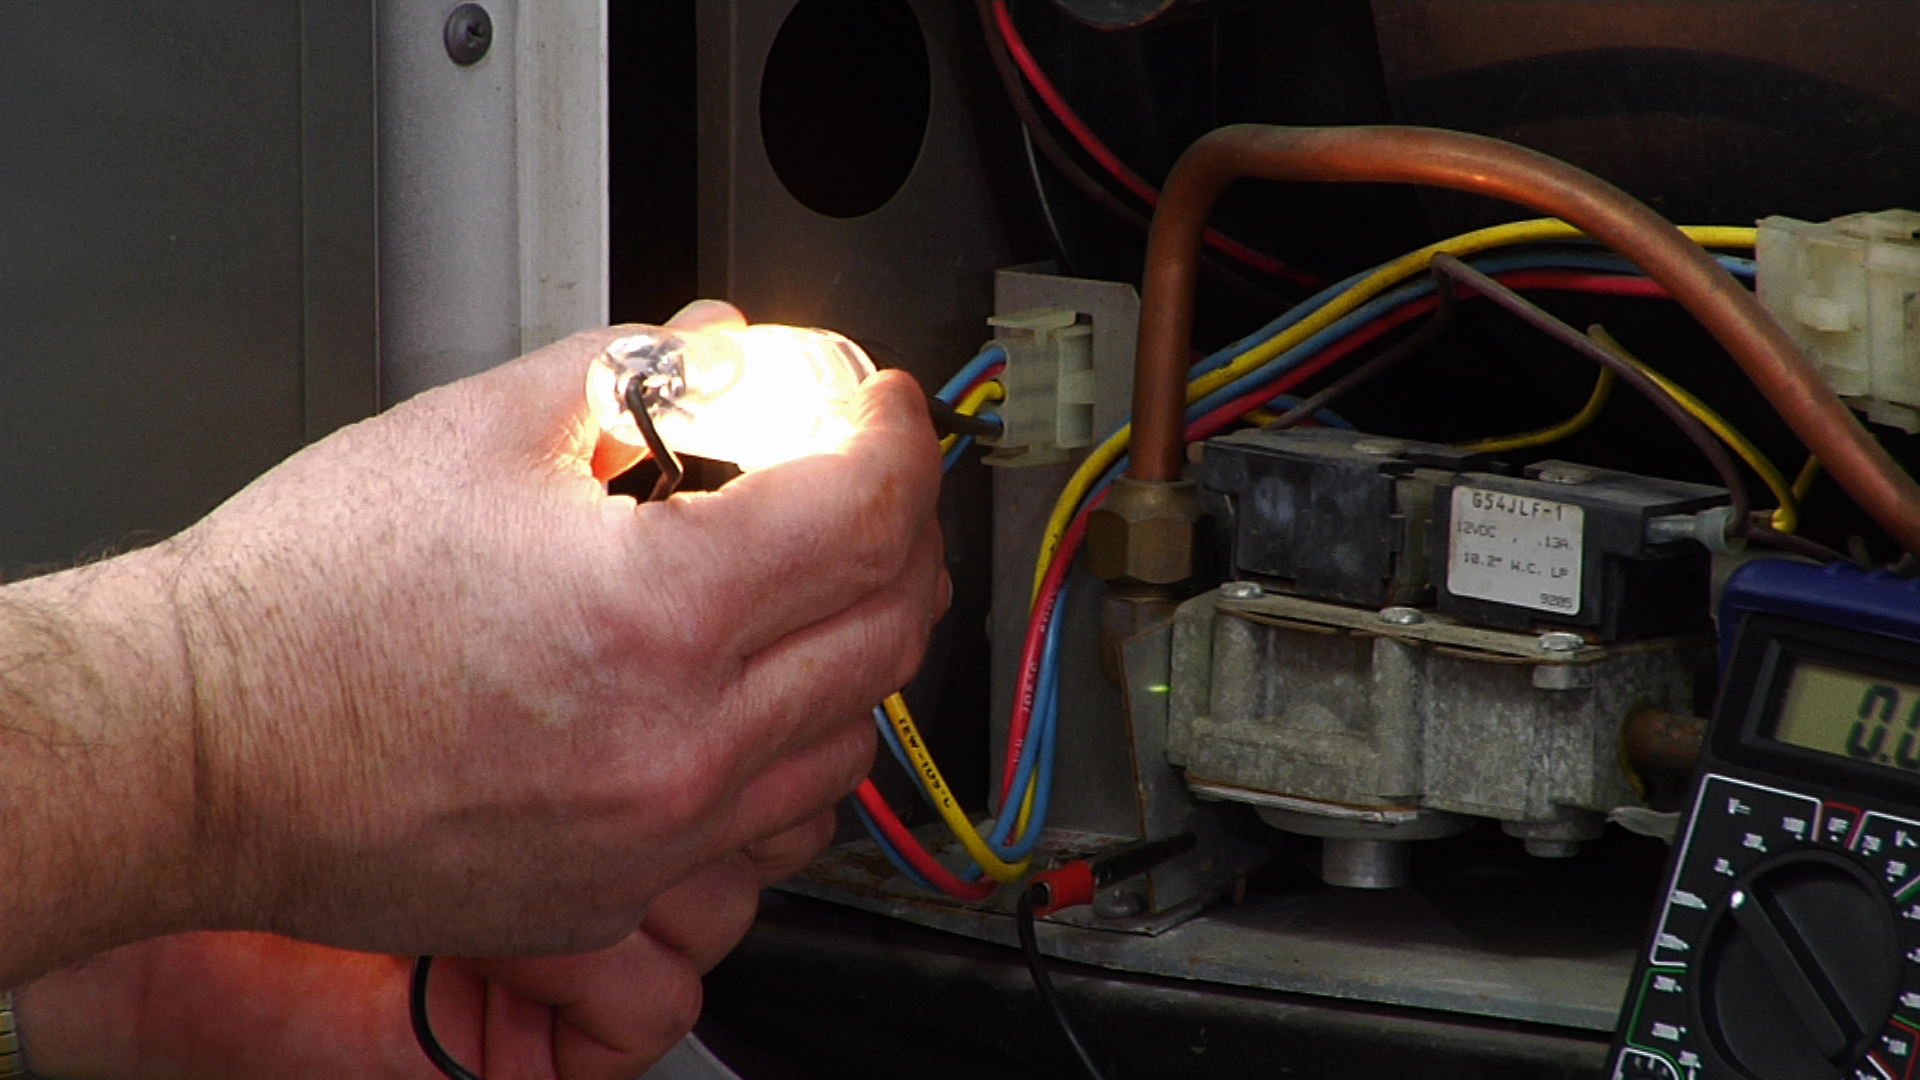 rv breaker box wiring diagram stx38 black deck furnace troubleshooting methods